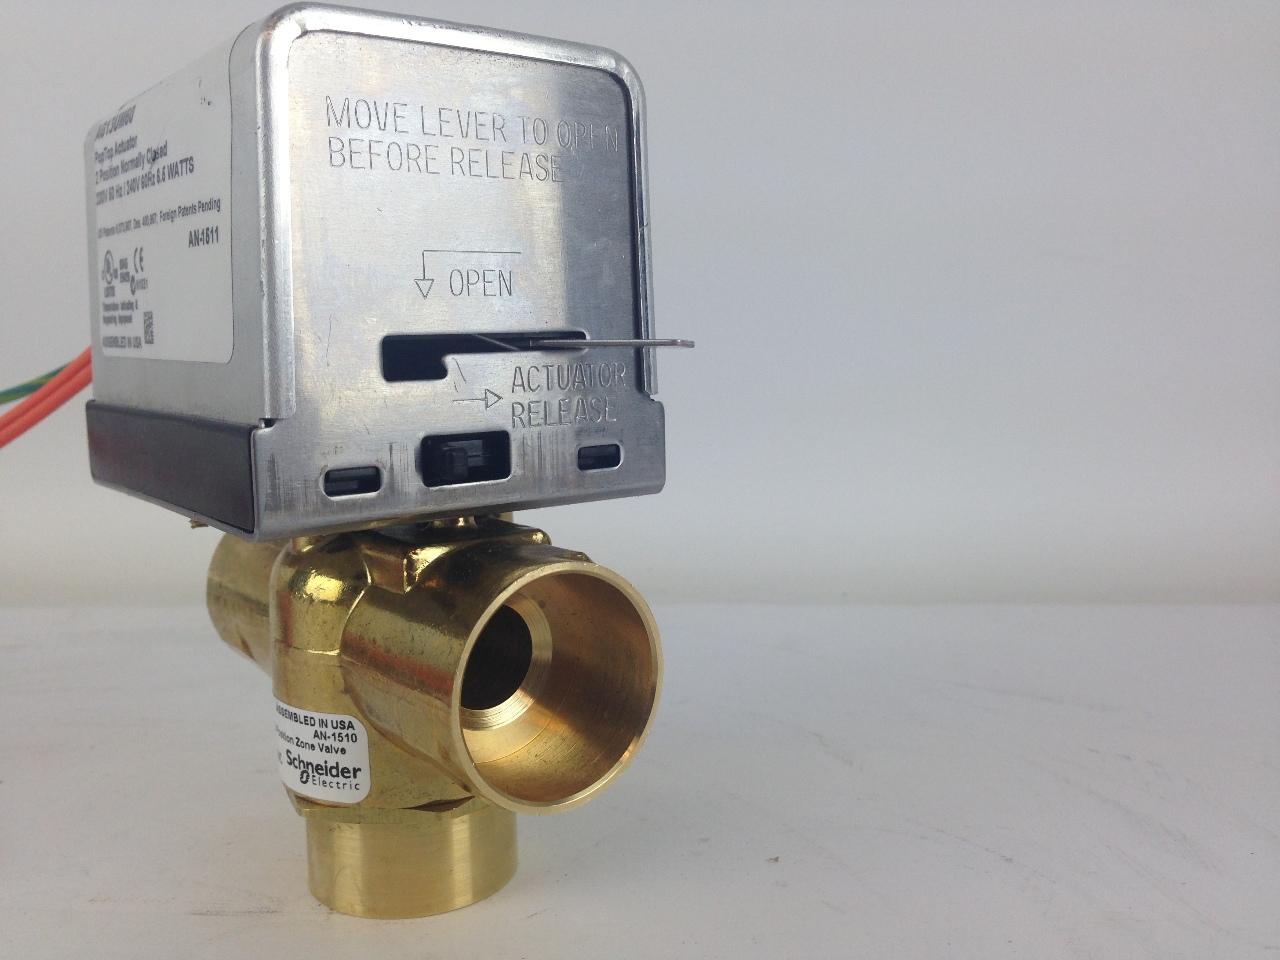 3 way zone valve wiring diagram 1998 dodge ram 2500 schneider electric vt3417g13um60 poptop ensamble de la